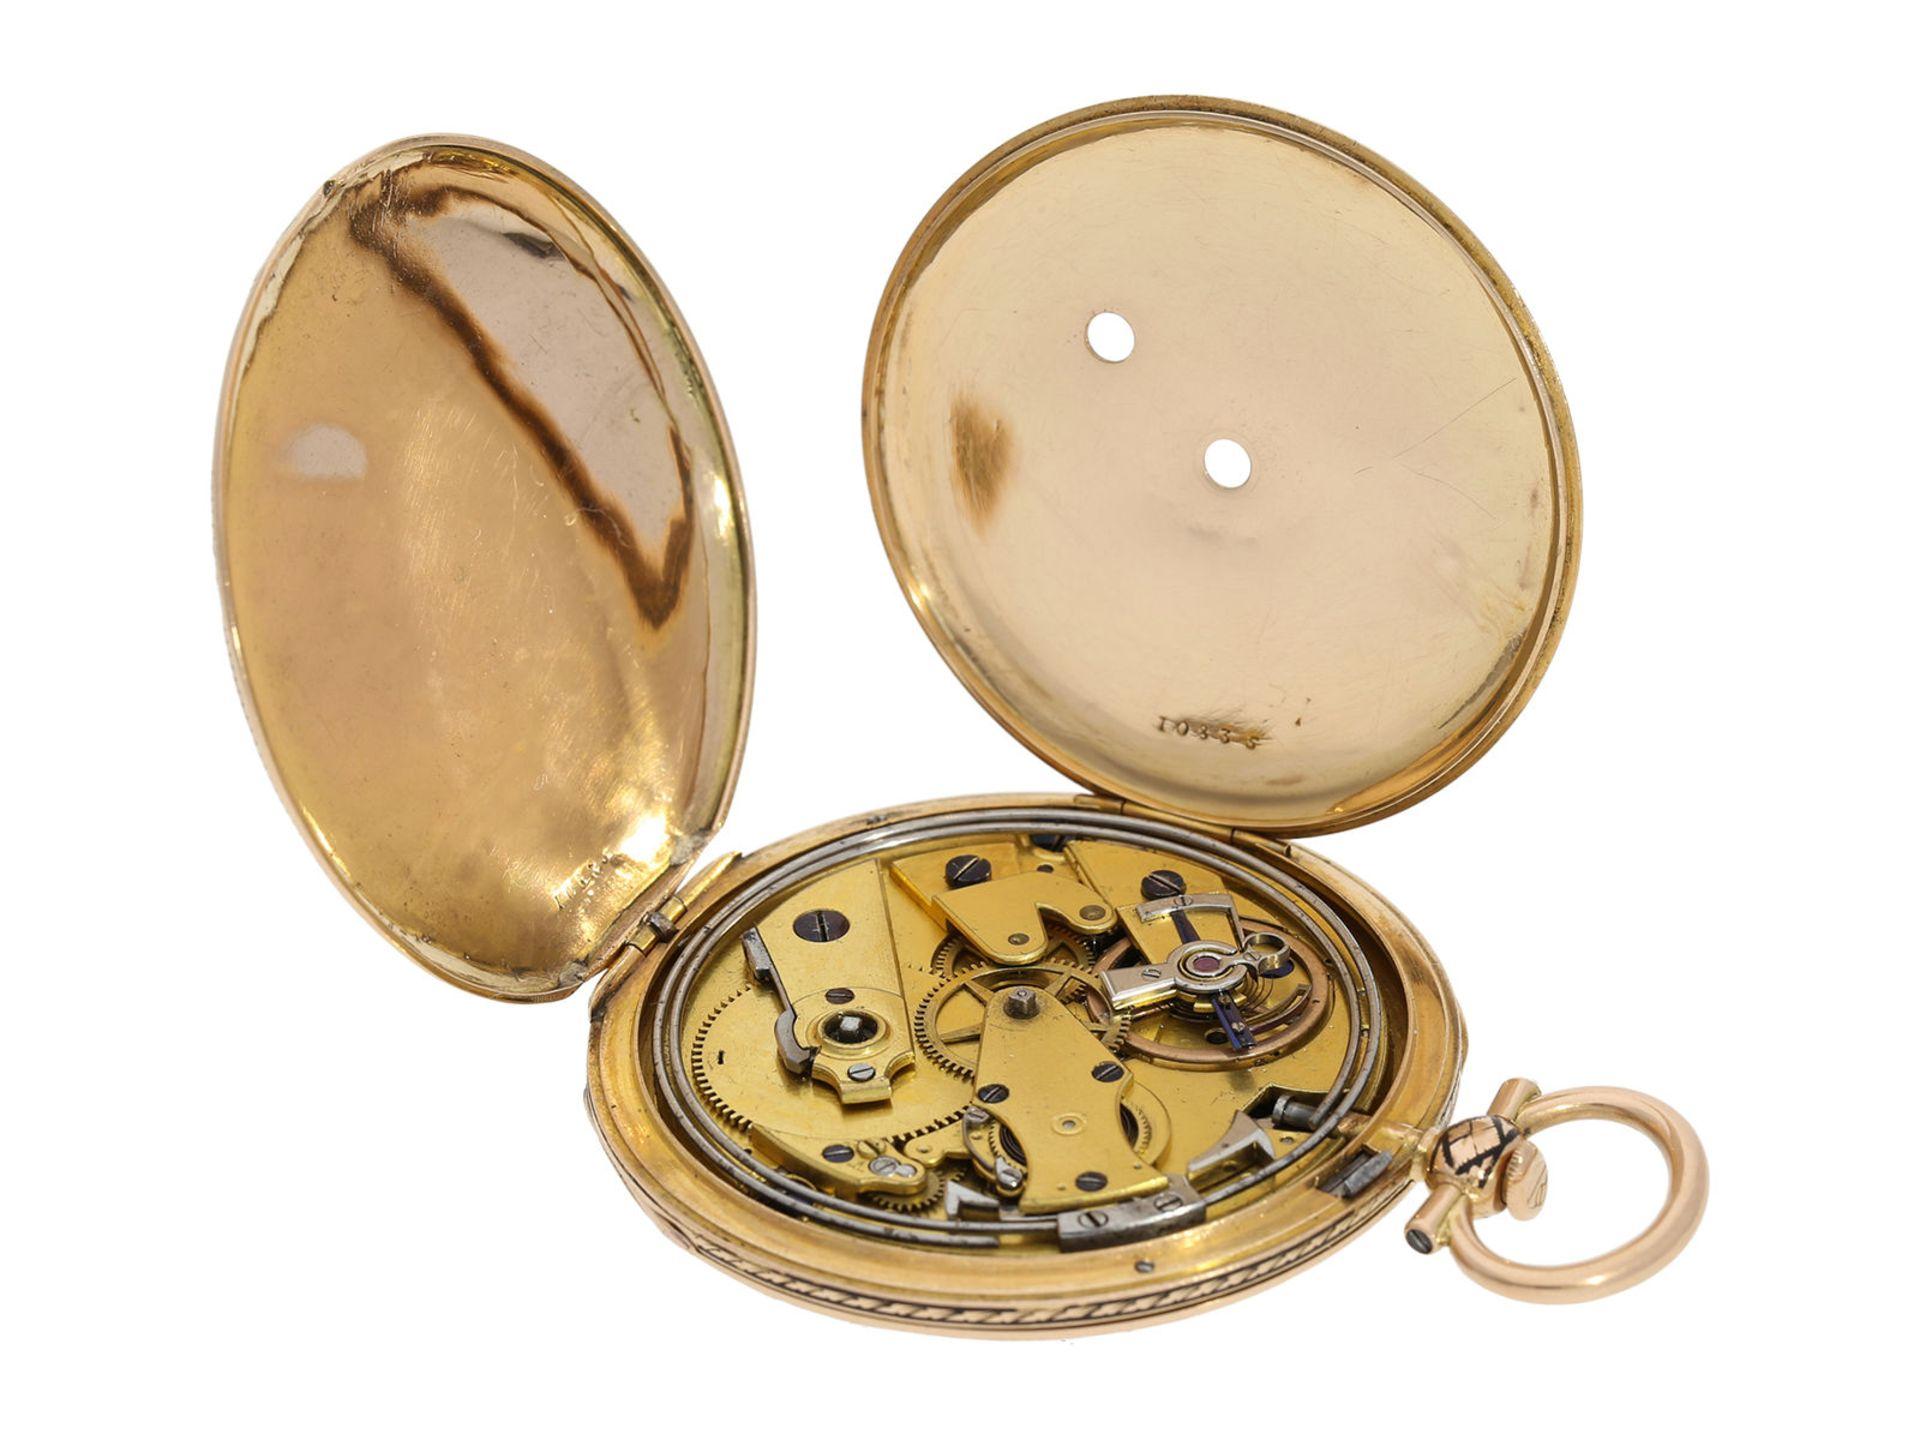 Pocket watch: magnificent gold/ enamel Lepine with rare case decoration and repeater, fine calibre - Bild 3 aus 7